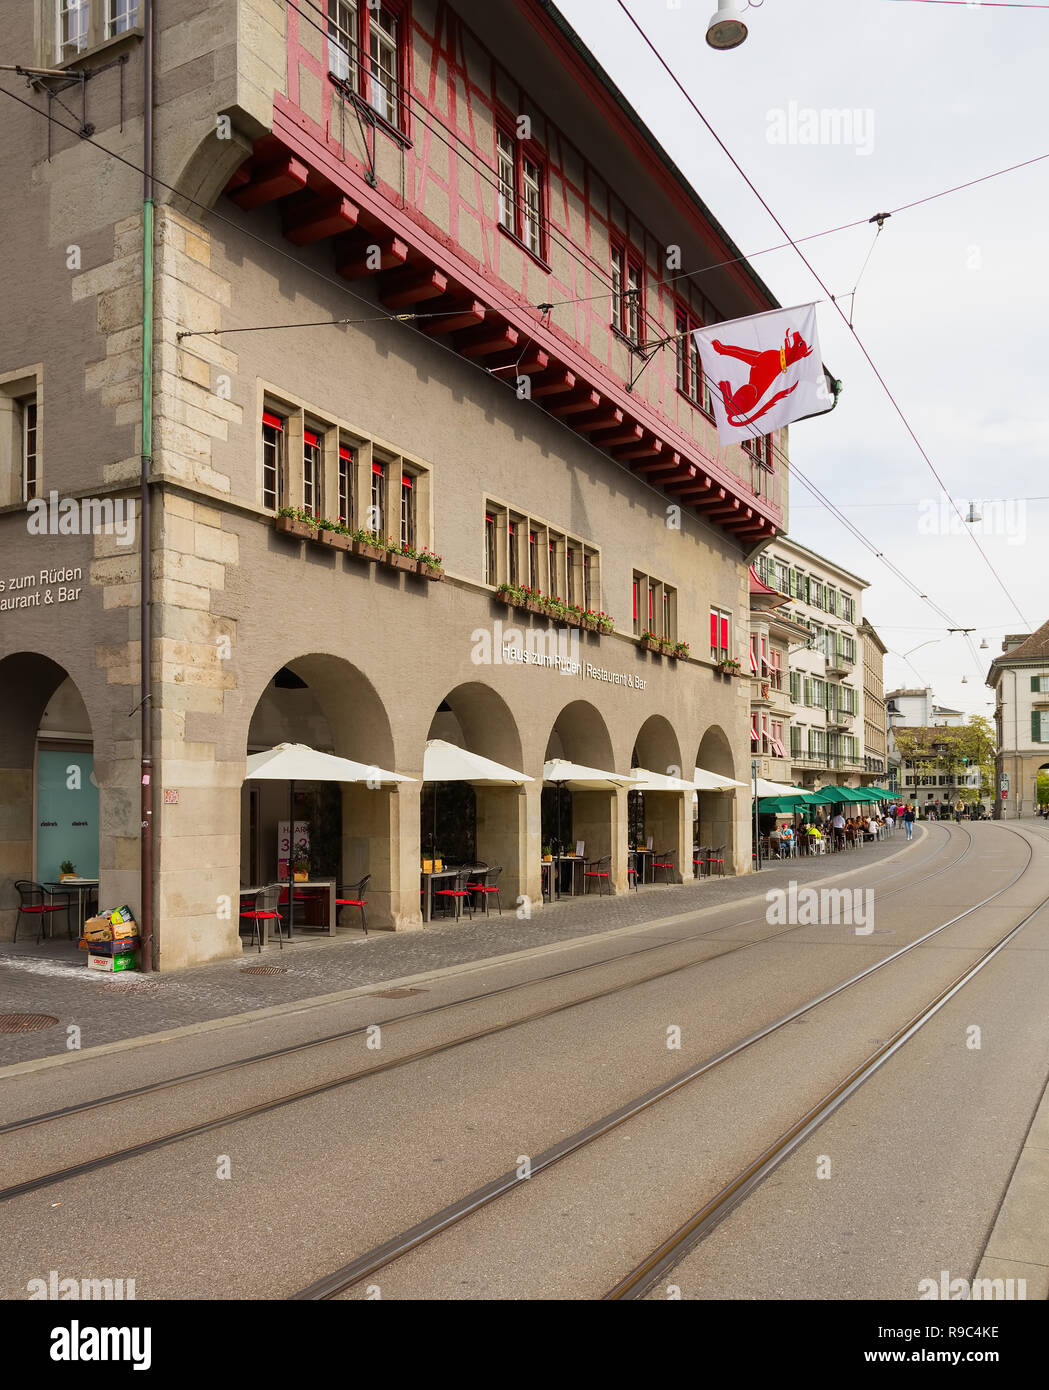 Zurich, Switzerland - May 25, 2016: view along Limmatquai quay in the city of Zurich. Zurich is the largest city in Switzerland and the capital of the - Stock Image